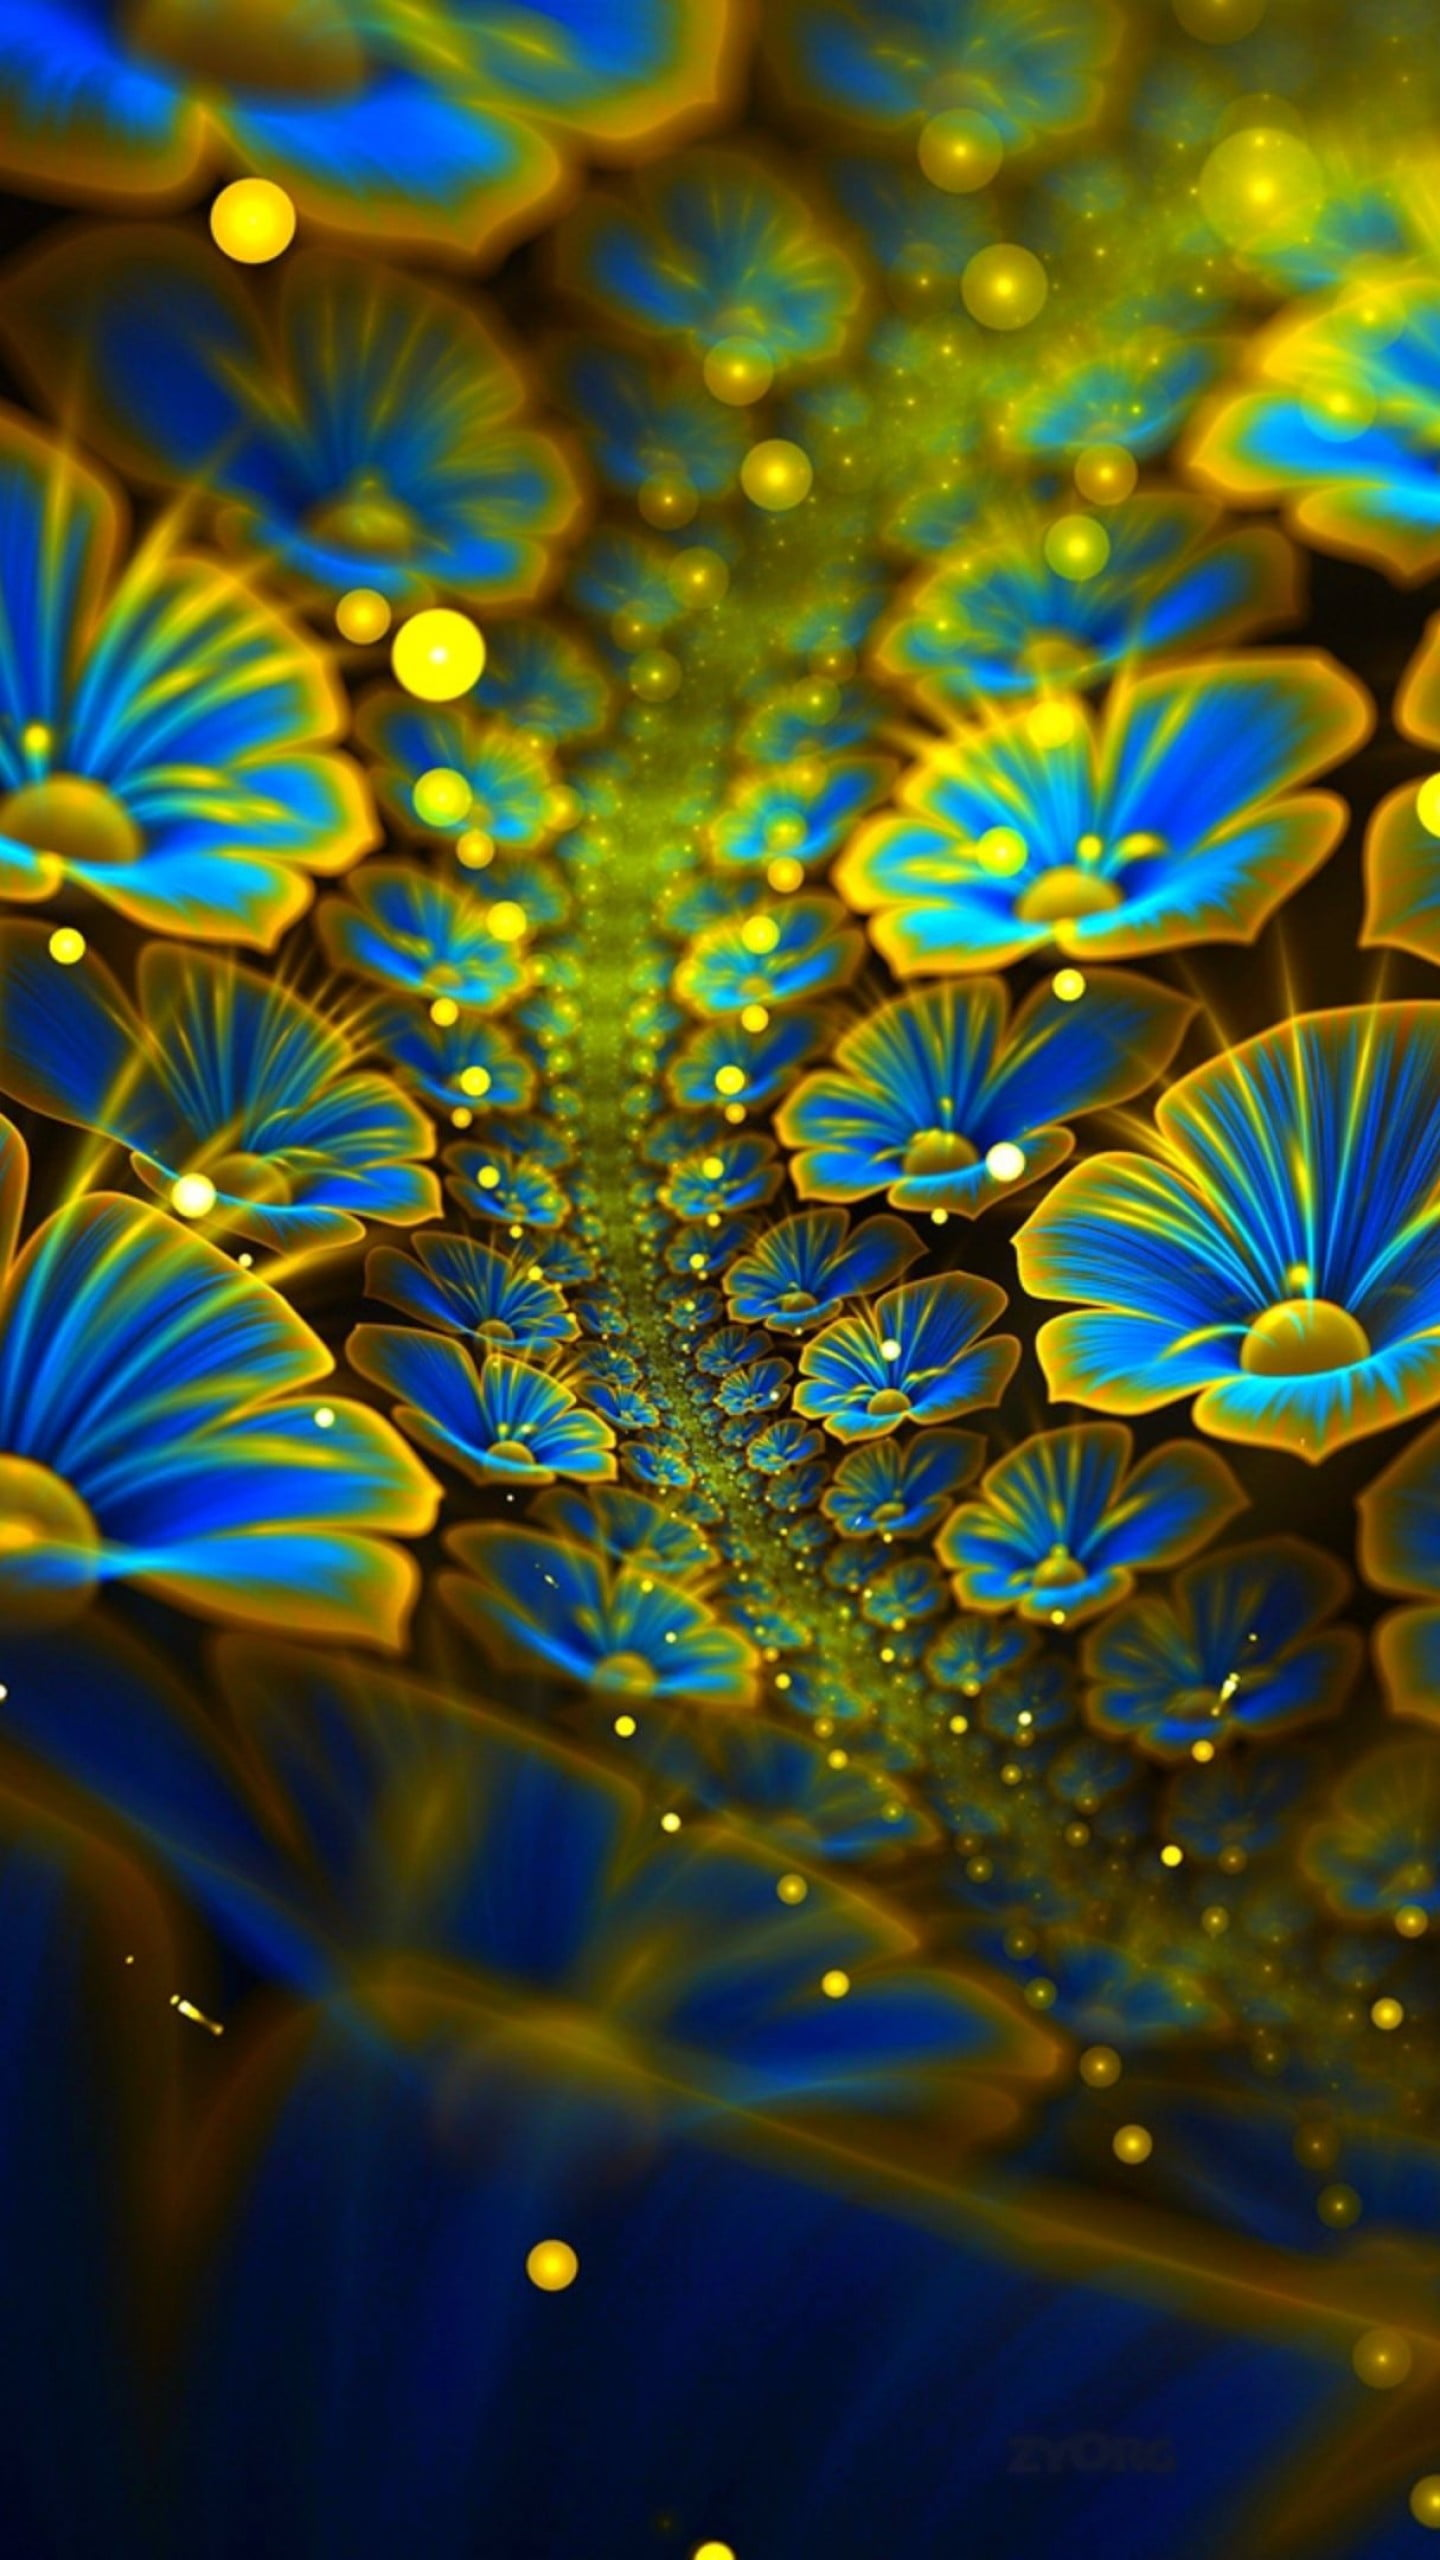 Flowers - Digital Art